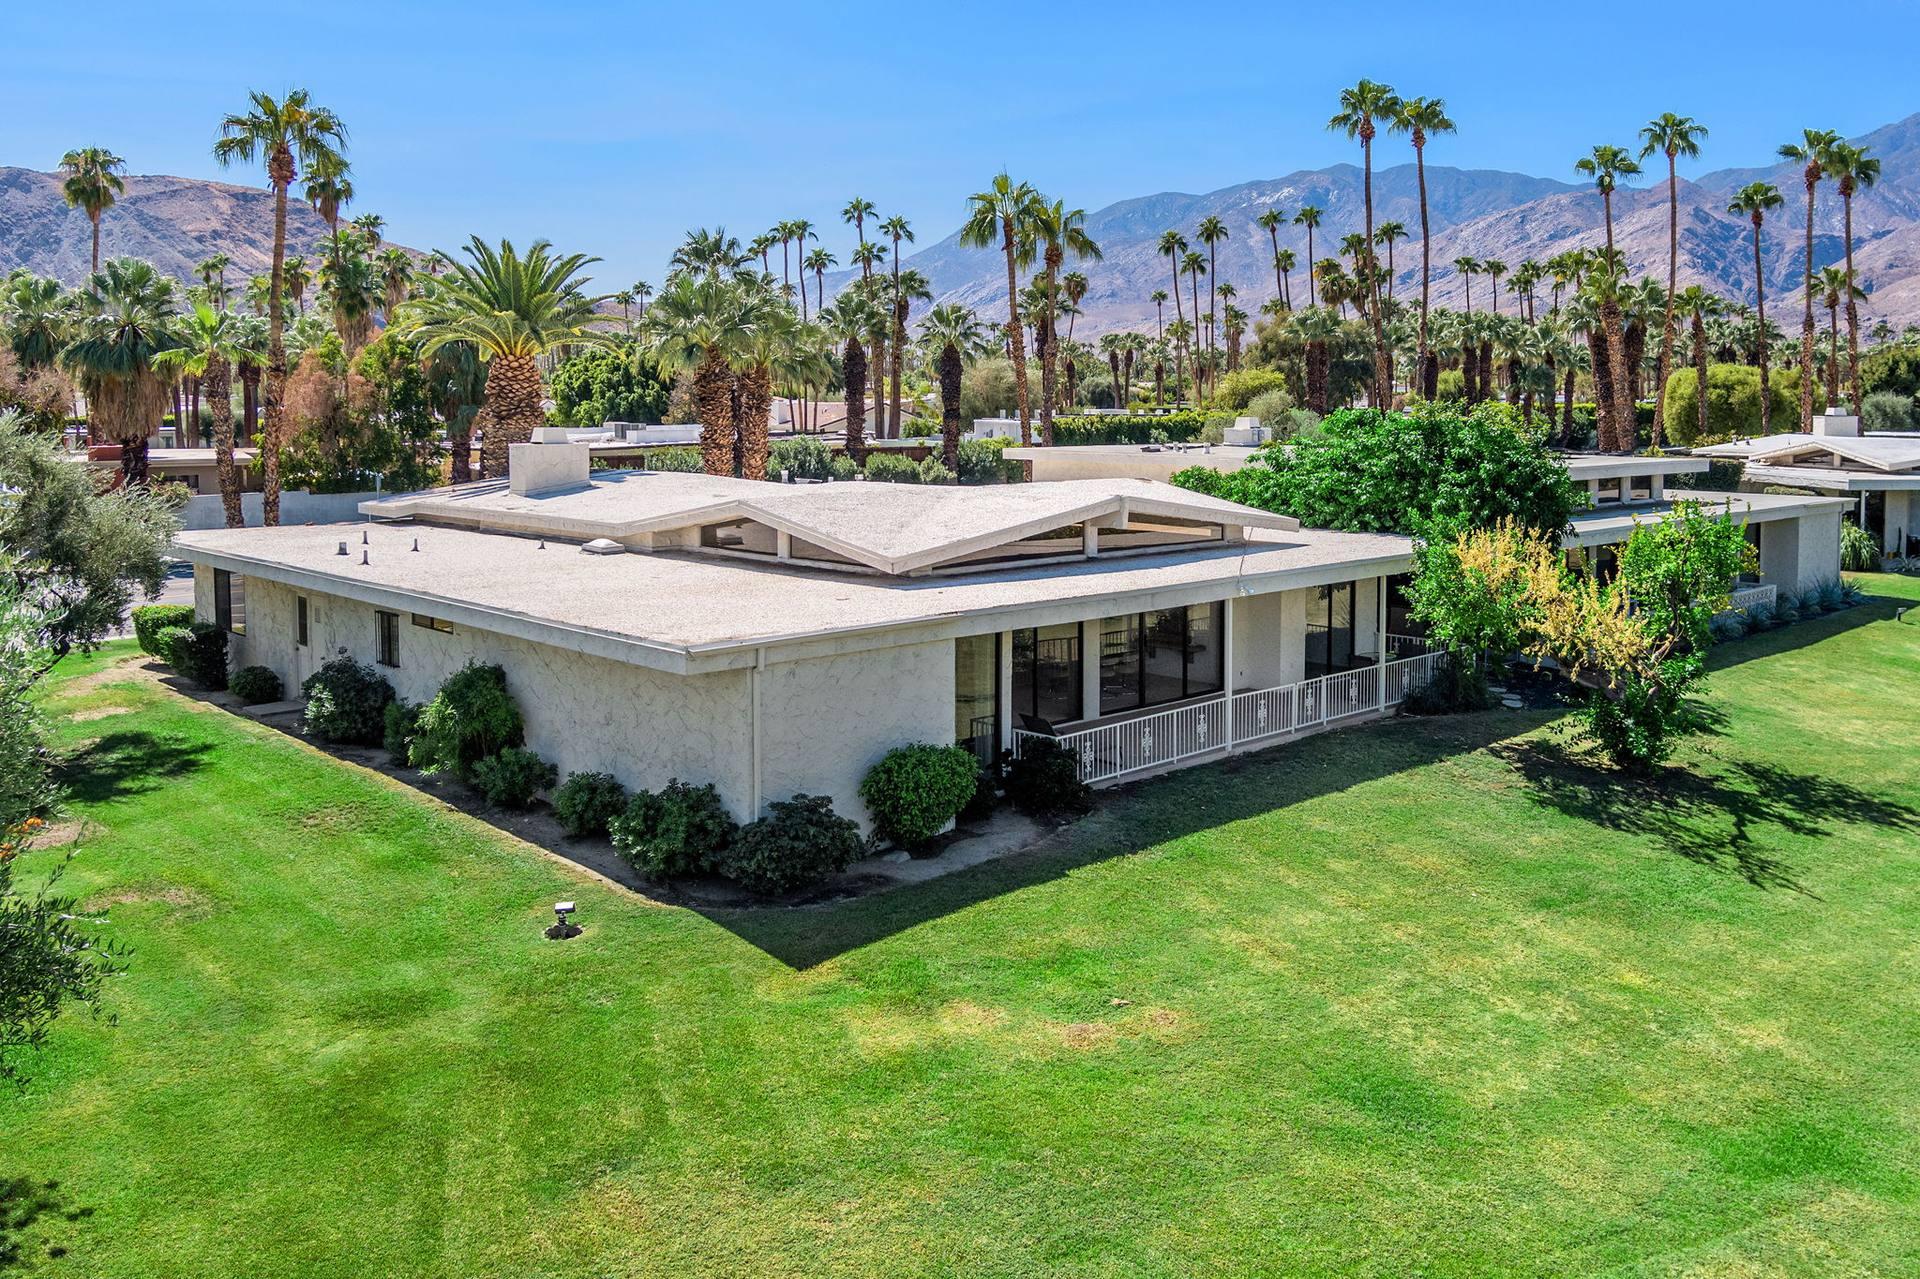 1536 S La Verne Way, Palm Springs, CA 92264, USA